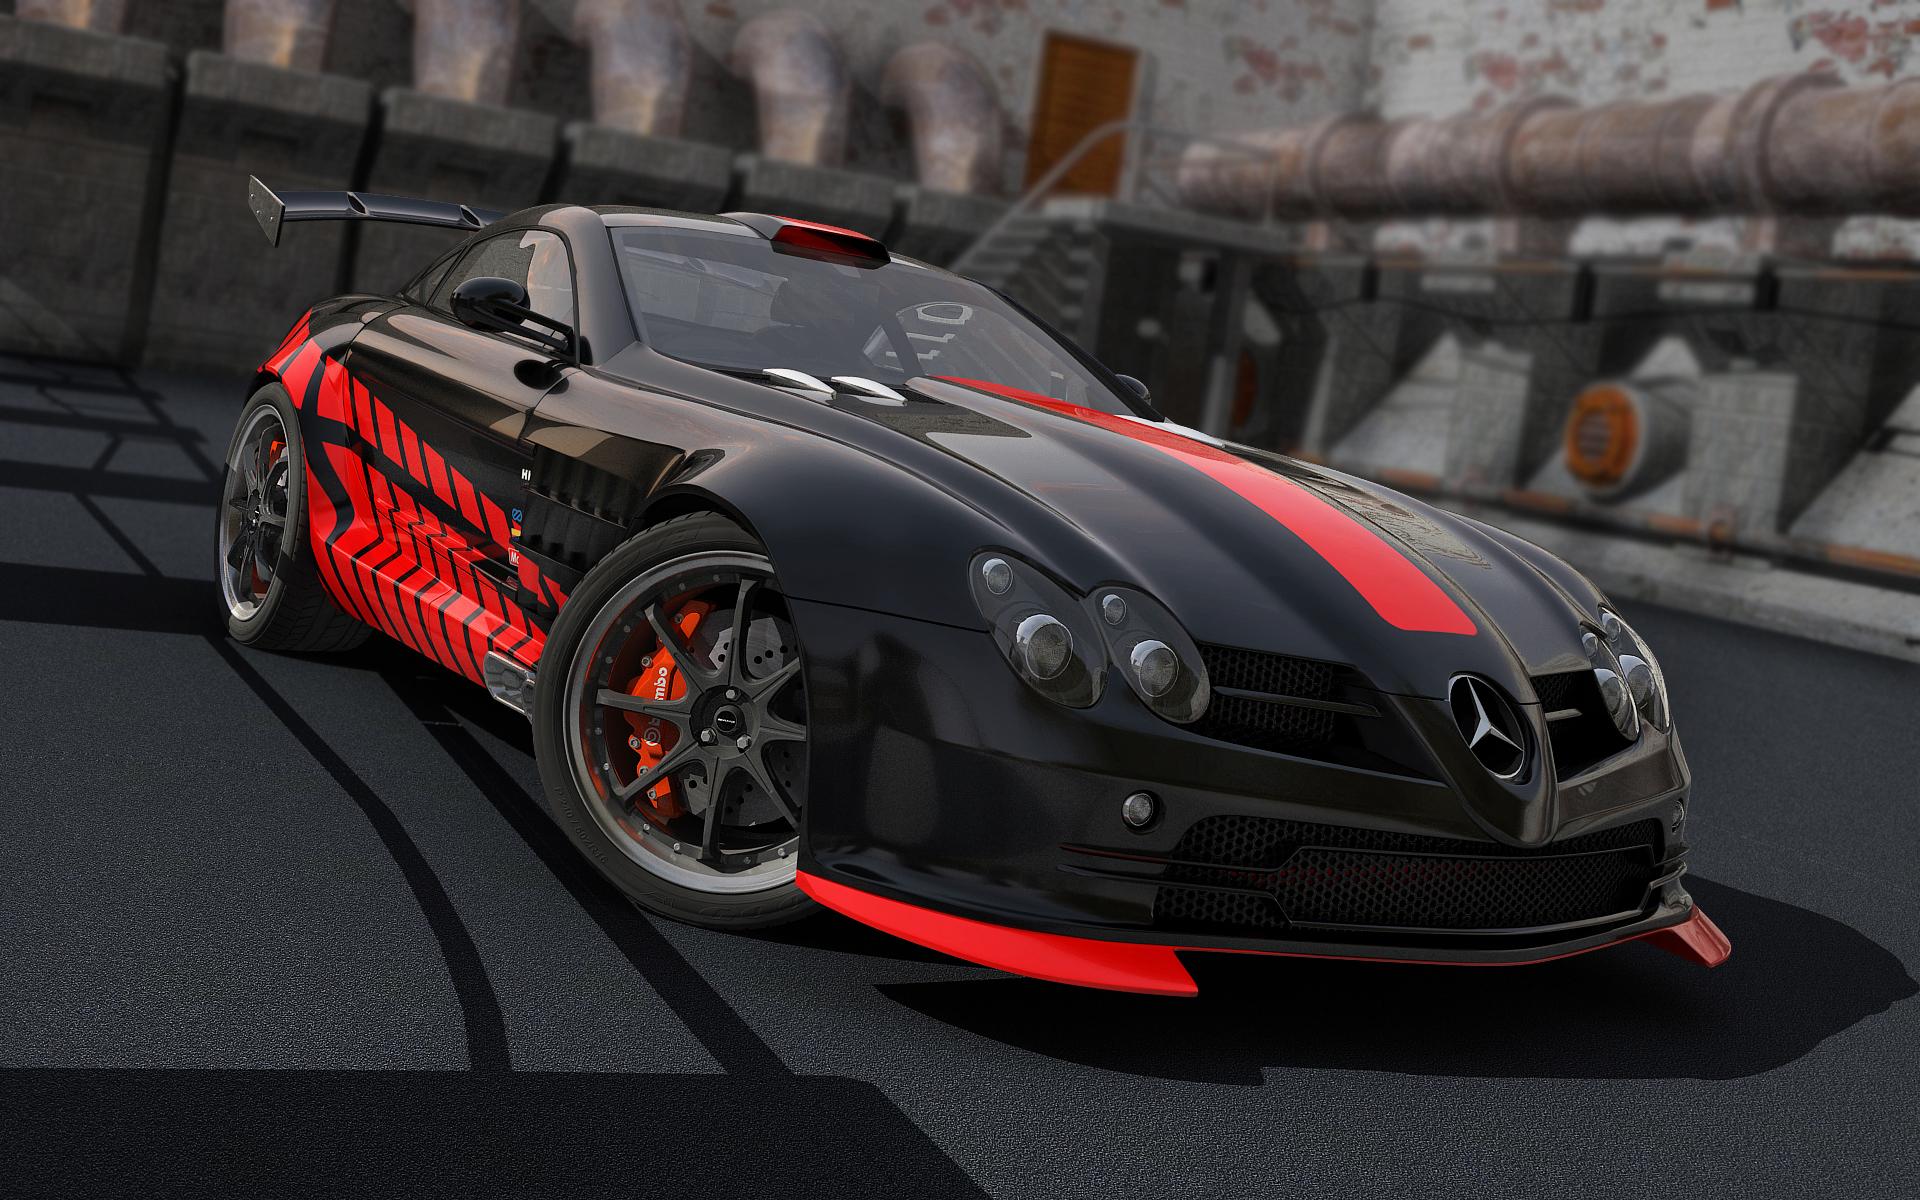 SLR McLaren new paintjob by stefanmarius